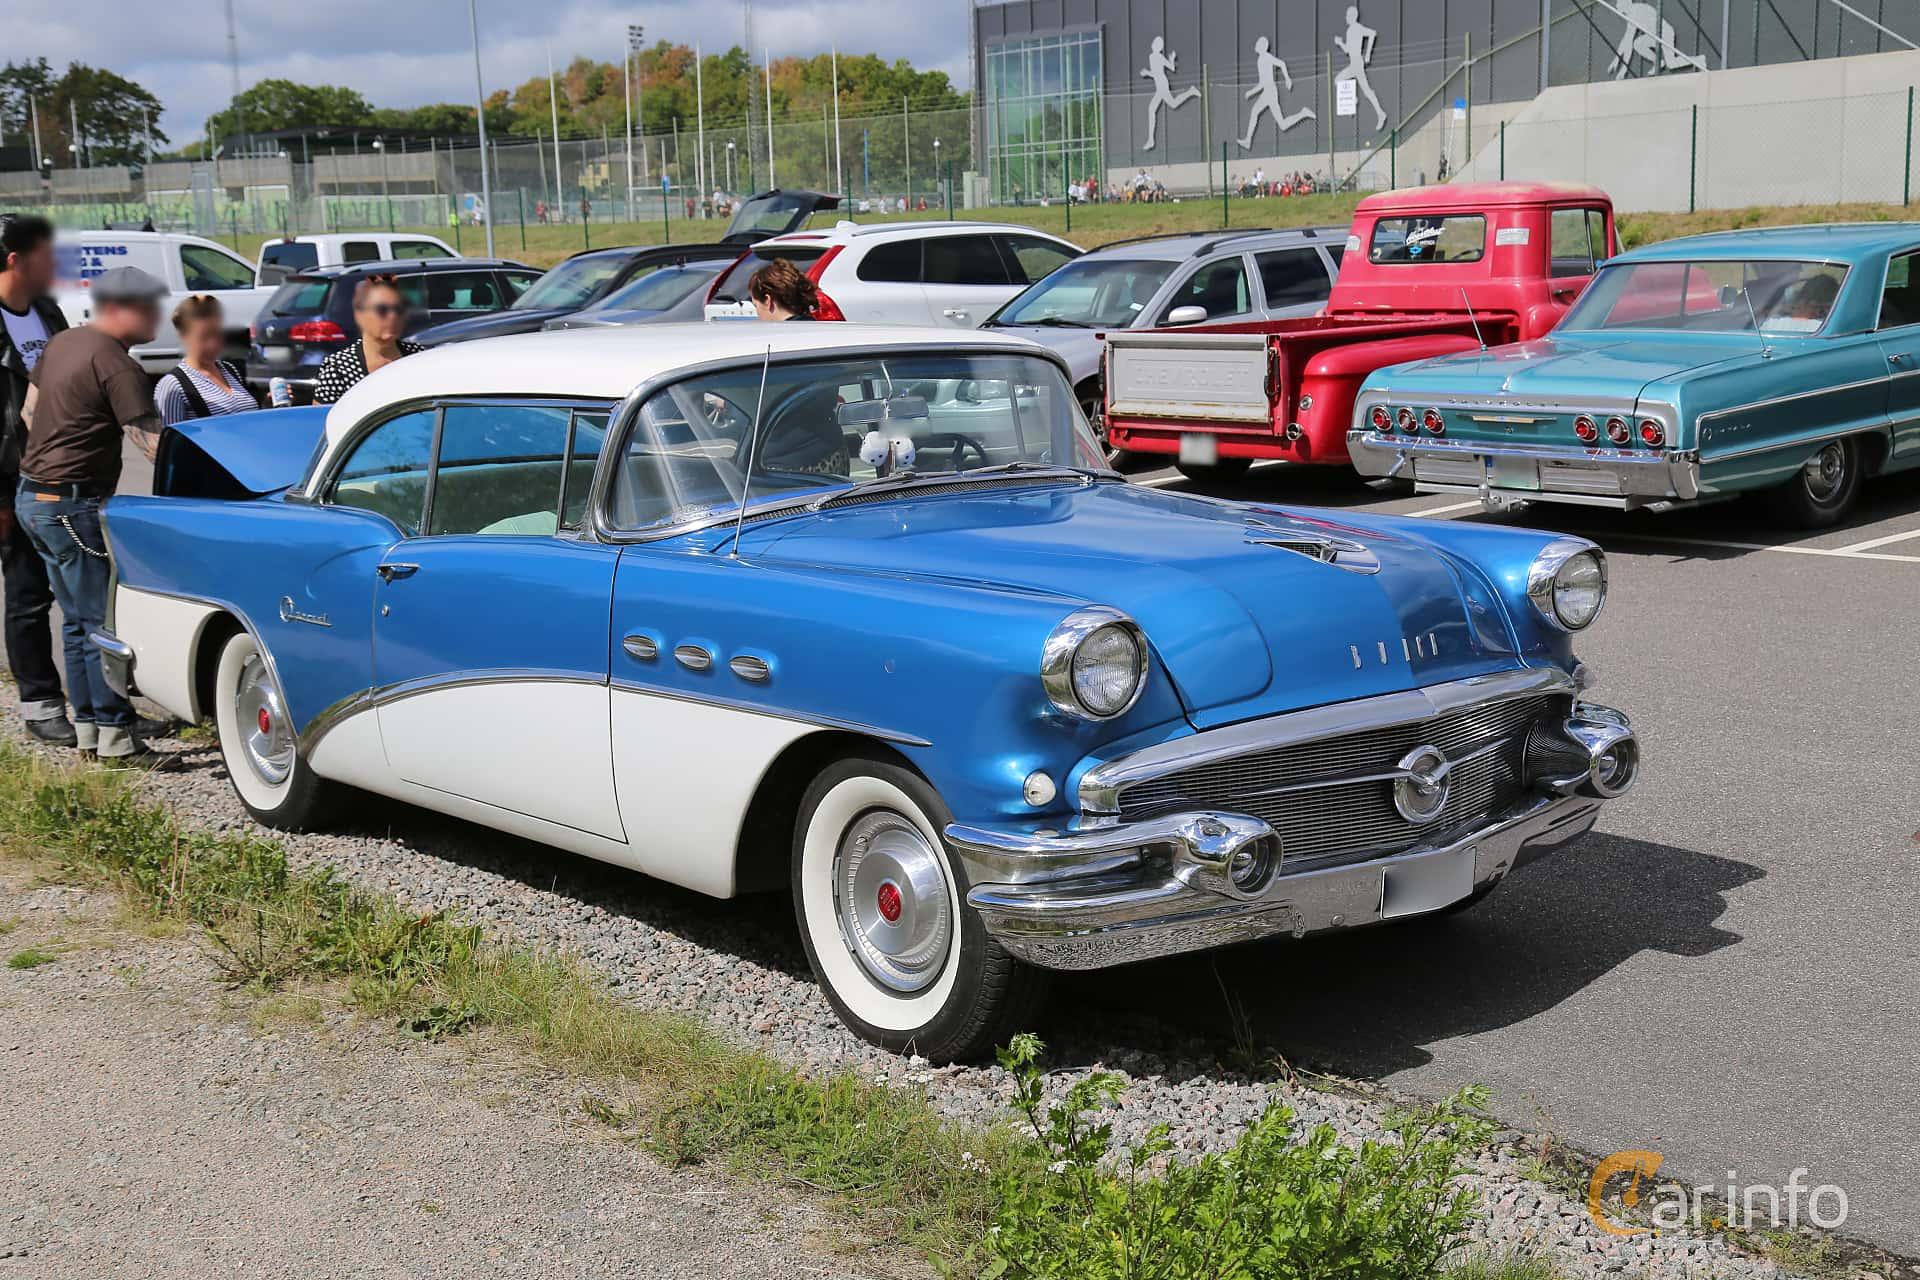 Buick Special 2-door Riviera 5.3 V8 Automatic, 223hp, 1956